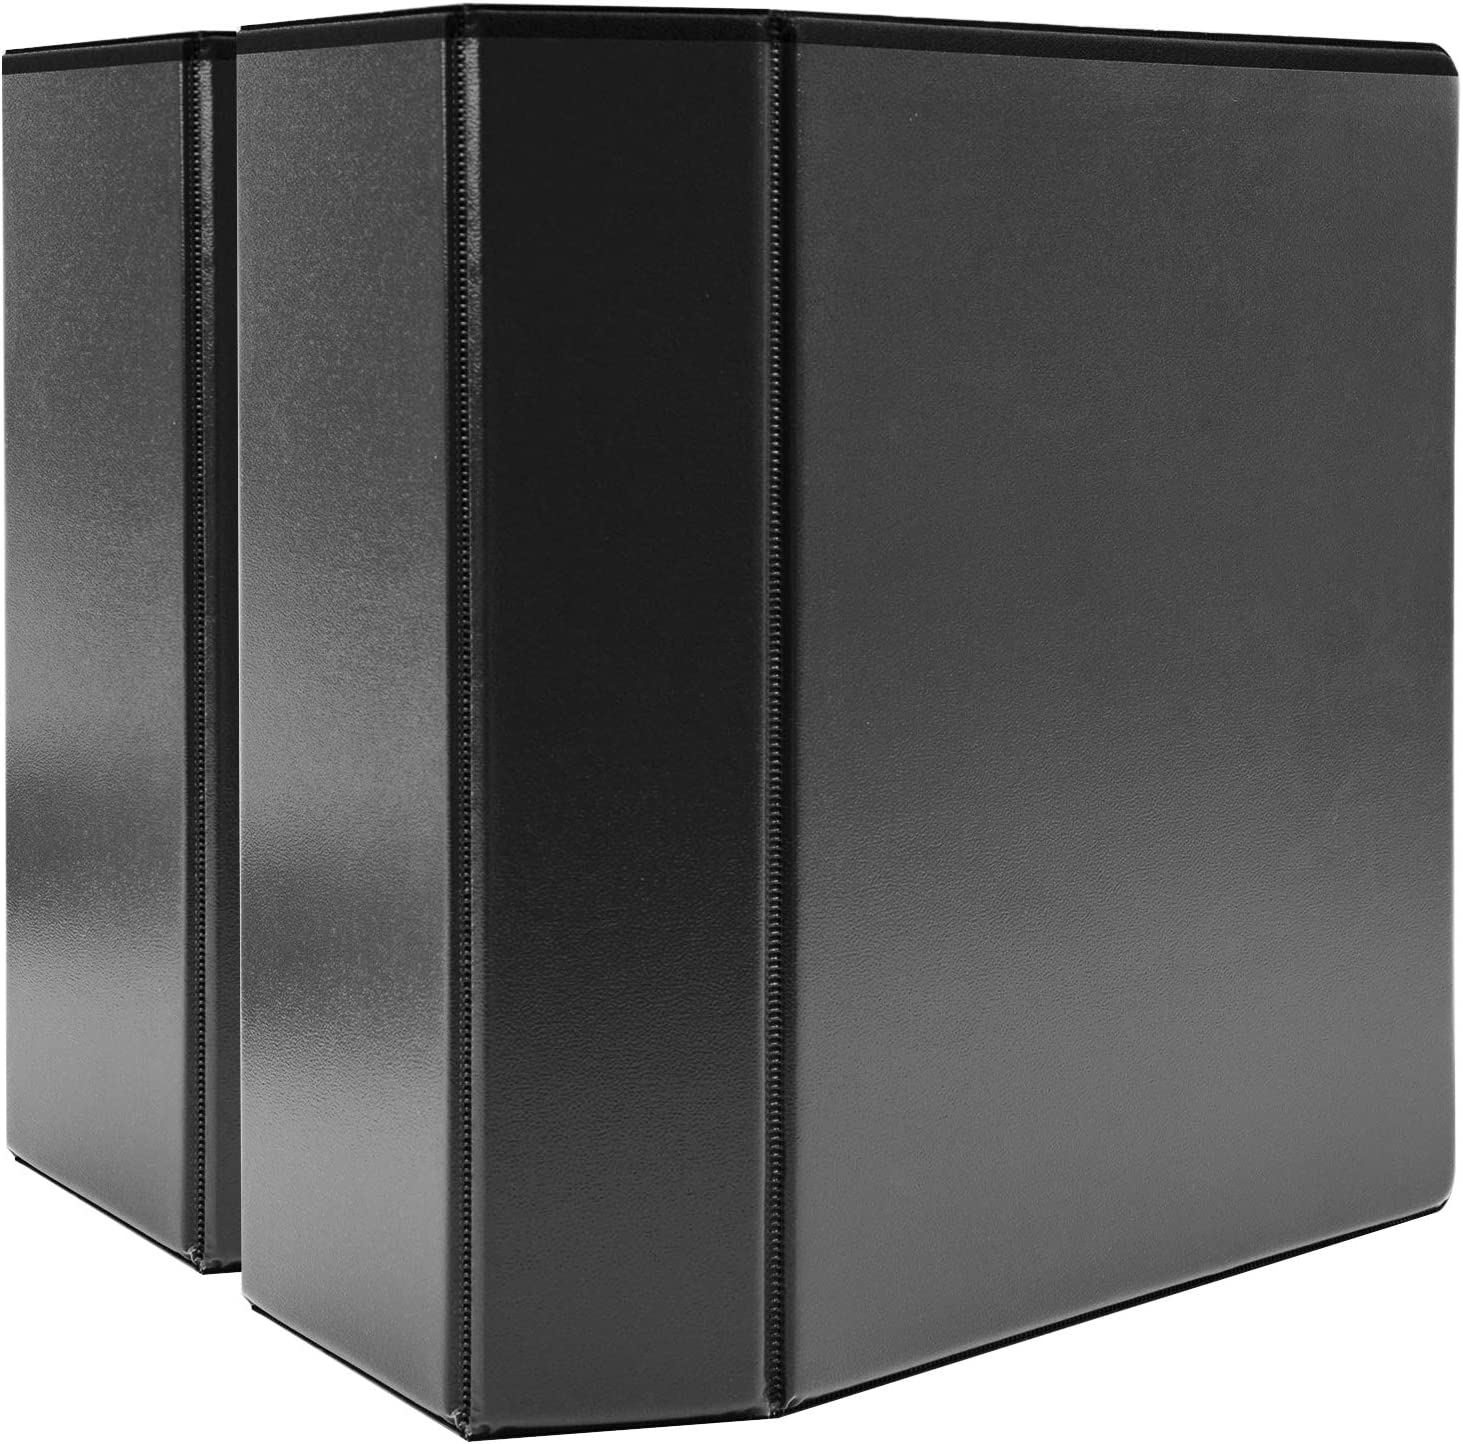 "AmazonBasics 5"" Heavy-Duty View 3 Ring Binder, Black, 2/Pack"